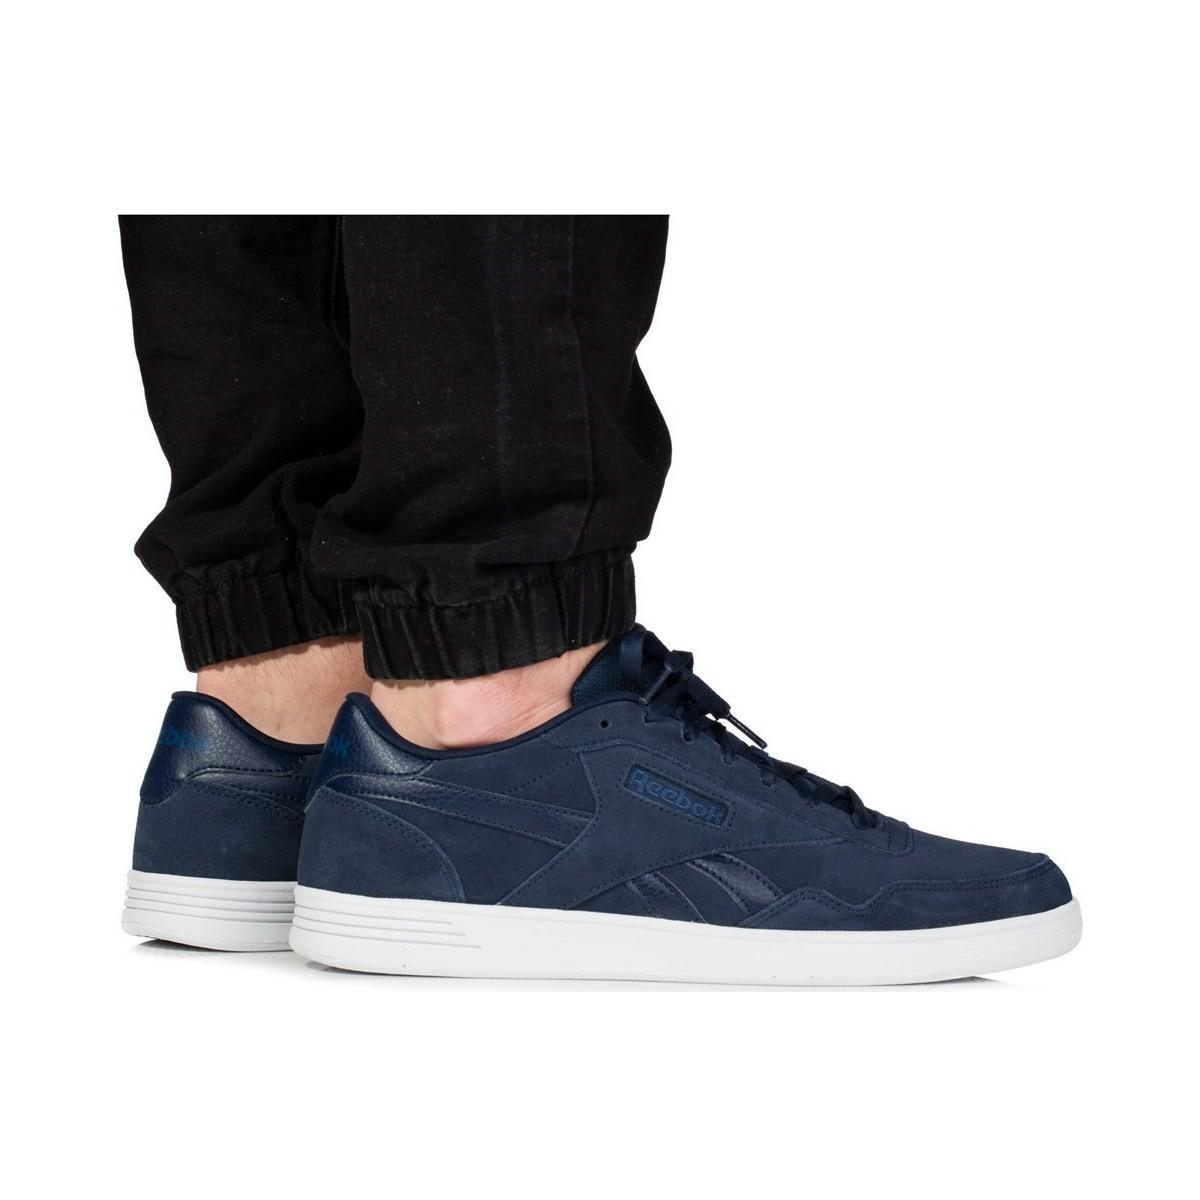 a7235362210f3 Reebok - Blue Royal Techque T Lx Men s Shoes (trainers) In Multicolour for  Men